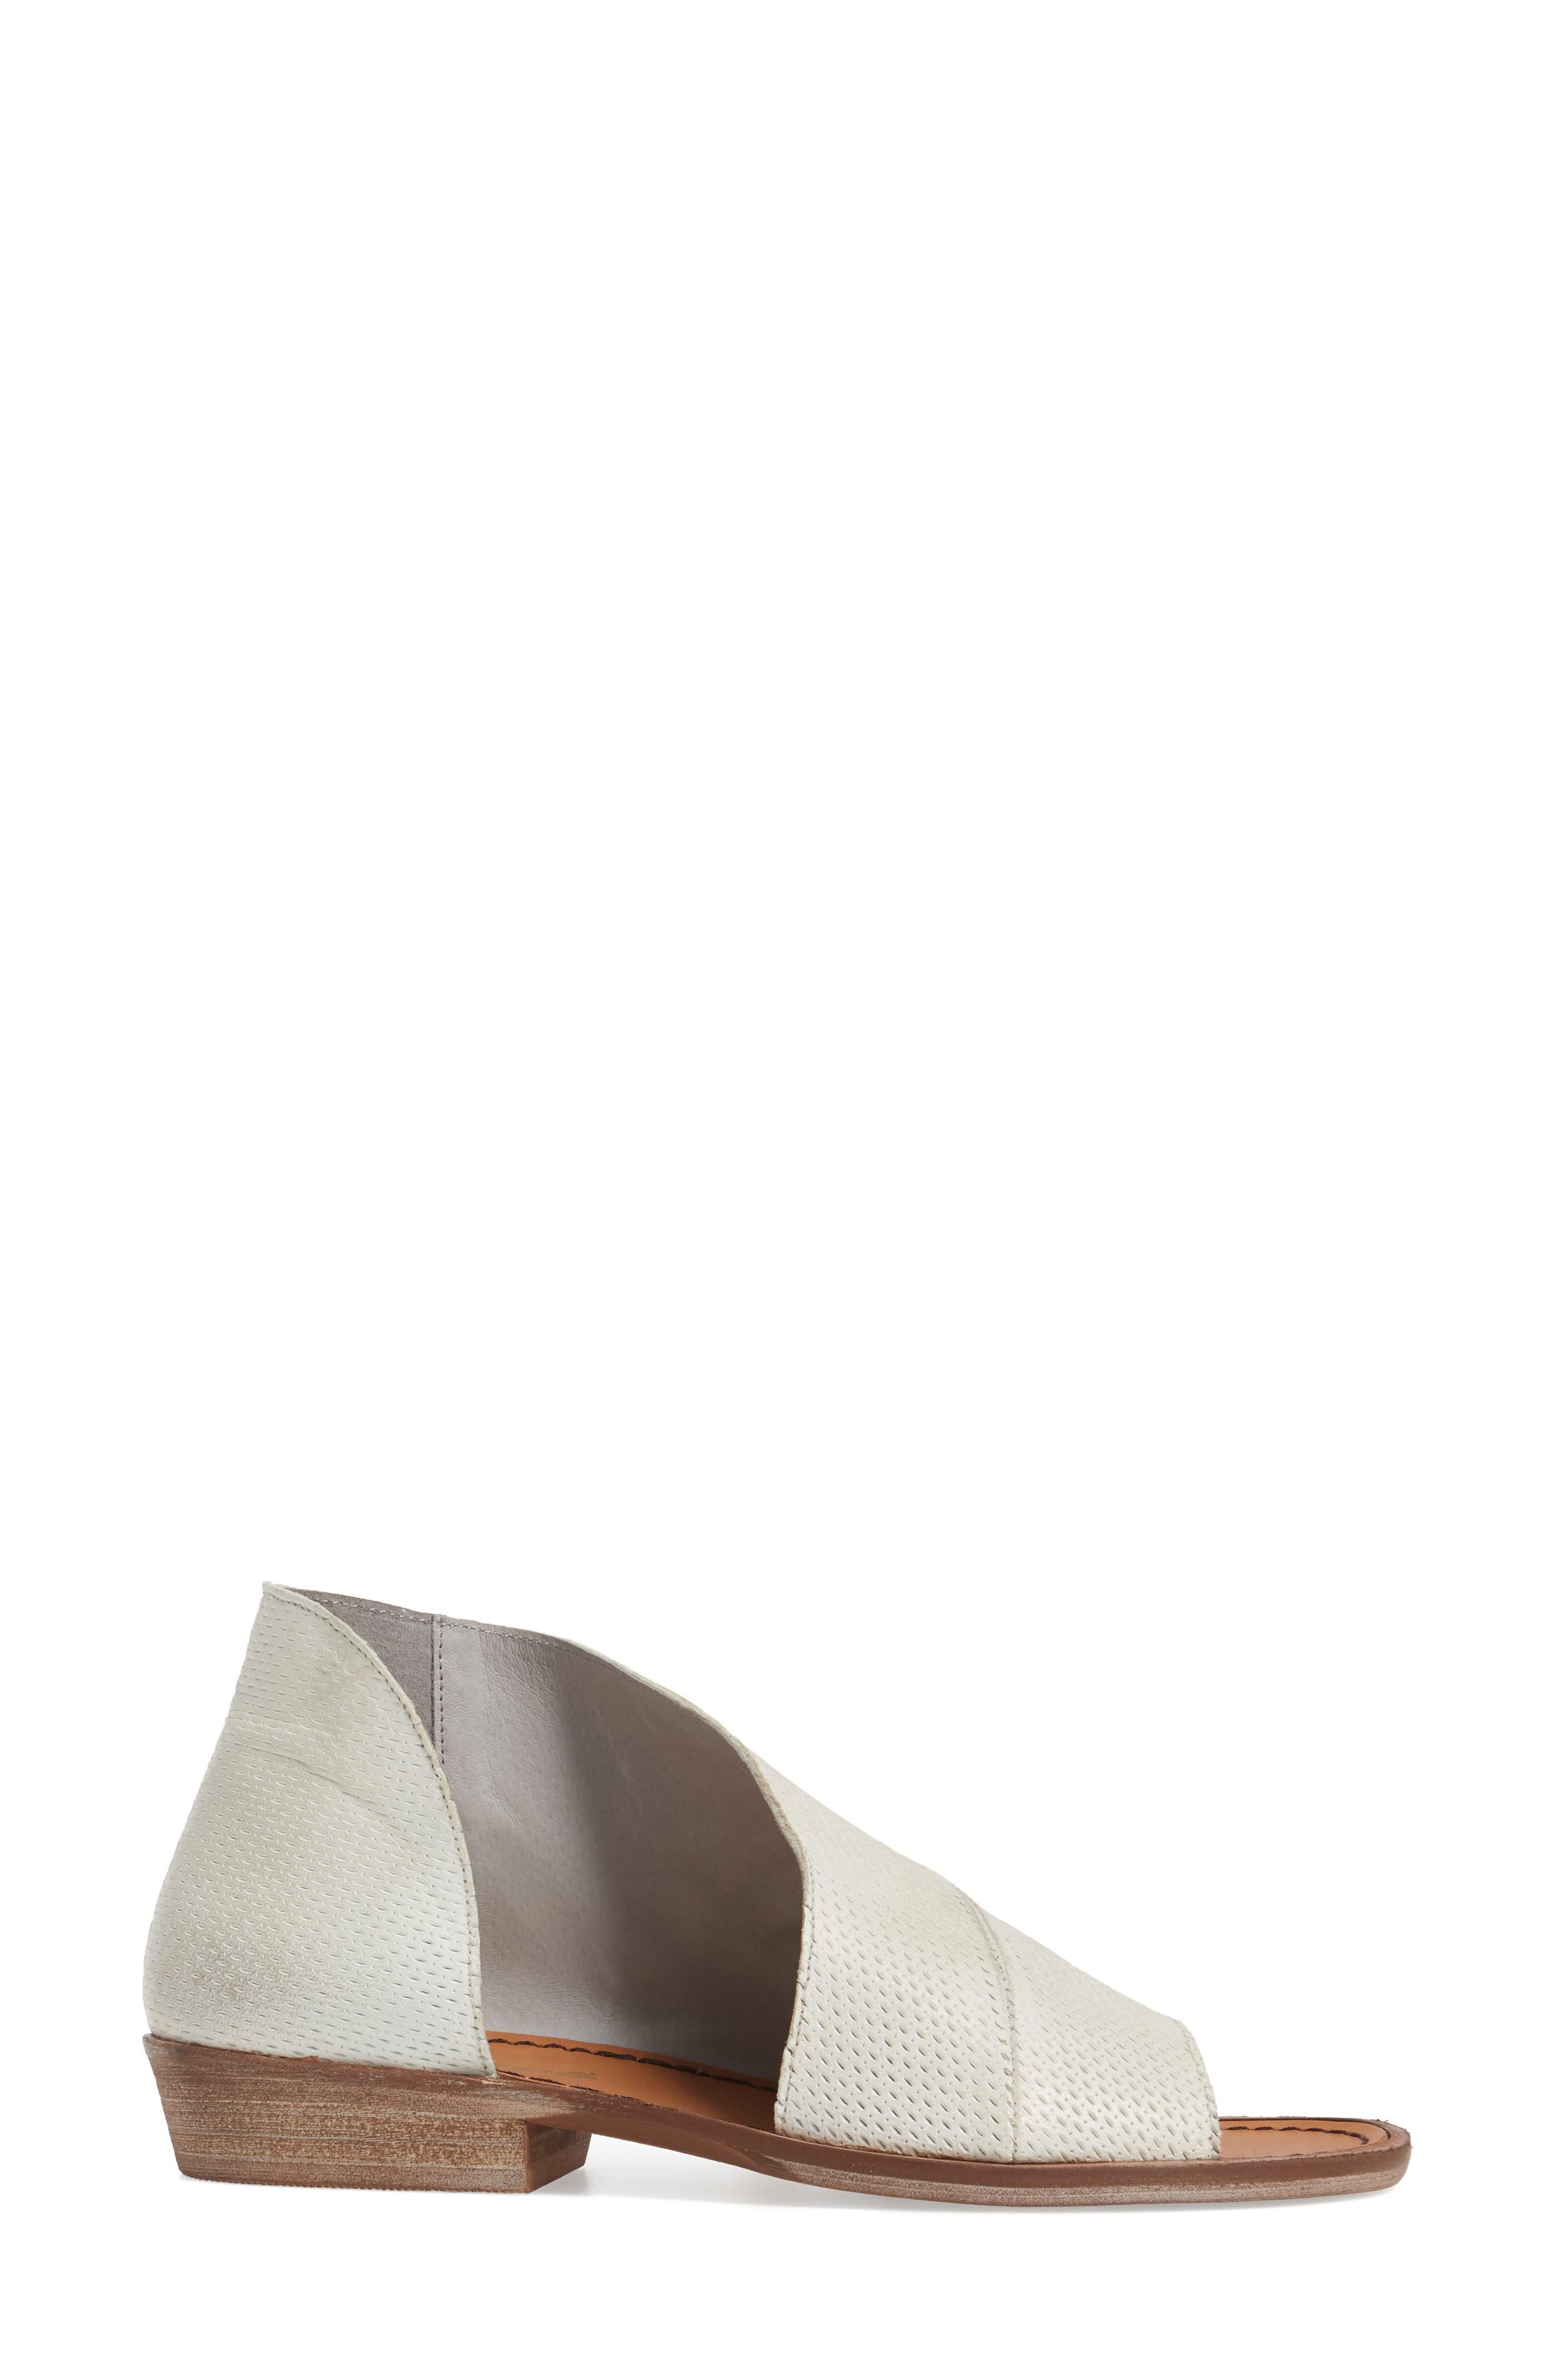 'Mont Blanc' Asymmetrical Sandal,                             Alternate thumbnail 37, color,